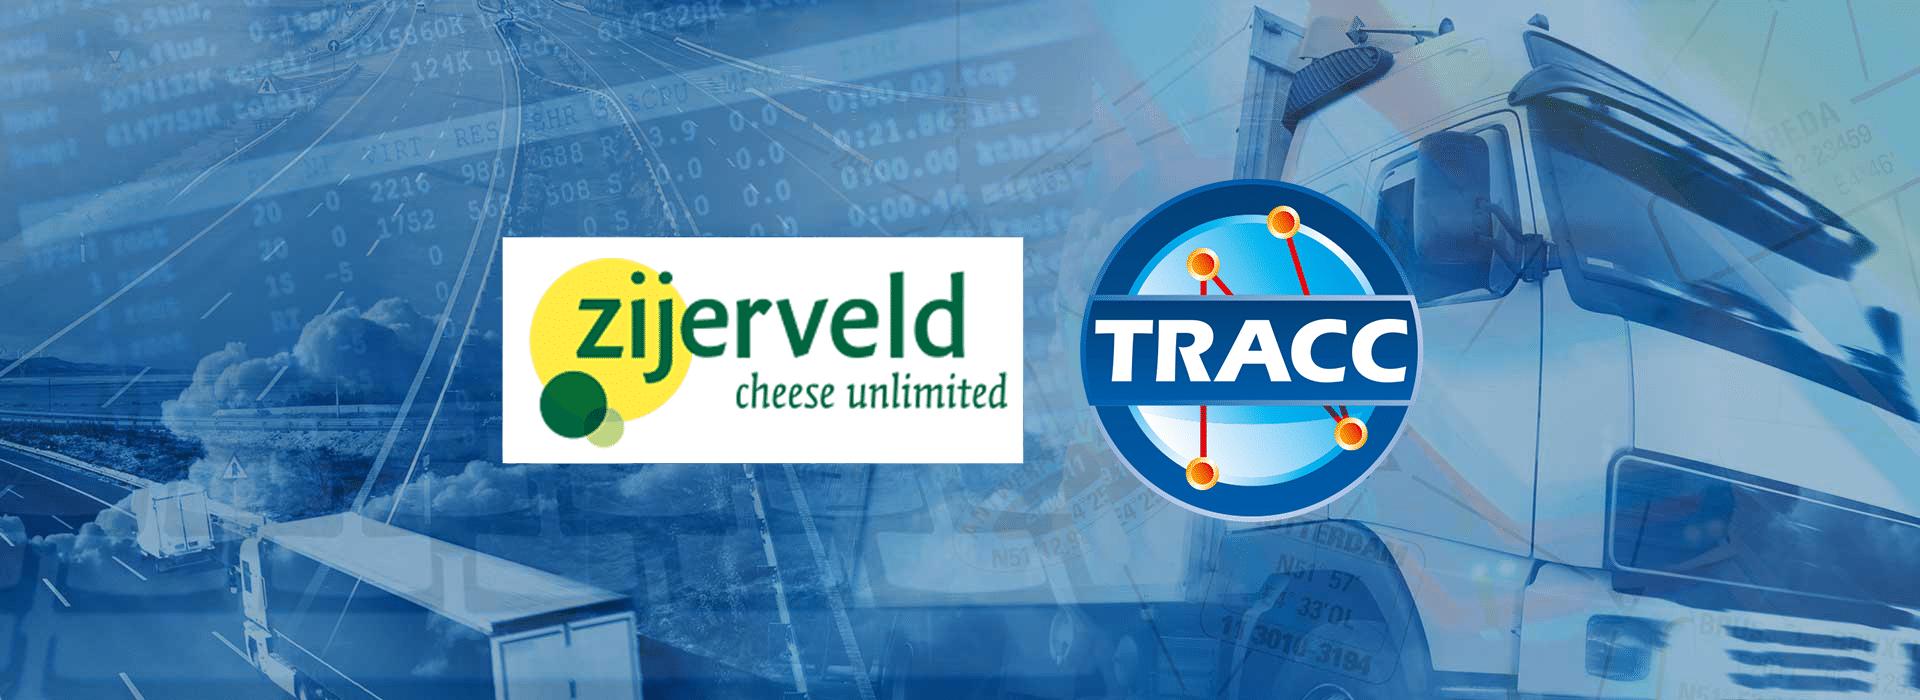 Zijerveld cheese unlimited transport in samenwerking met AKB Logistics Software